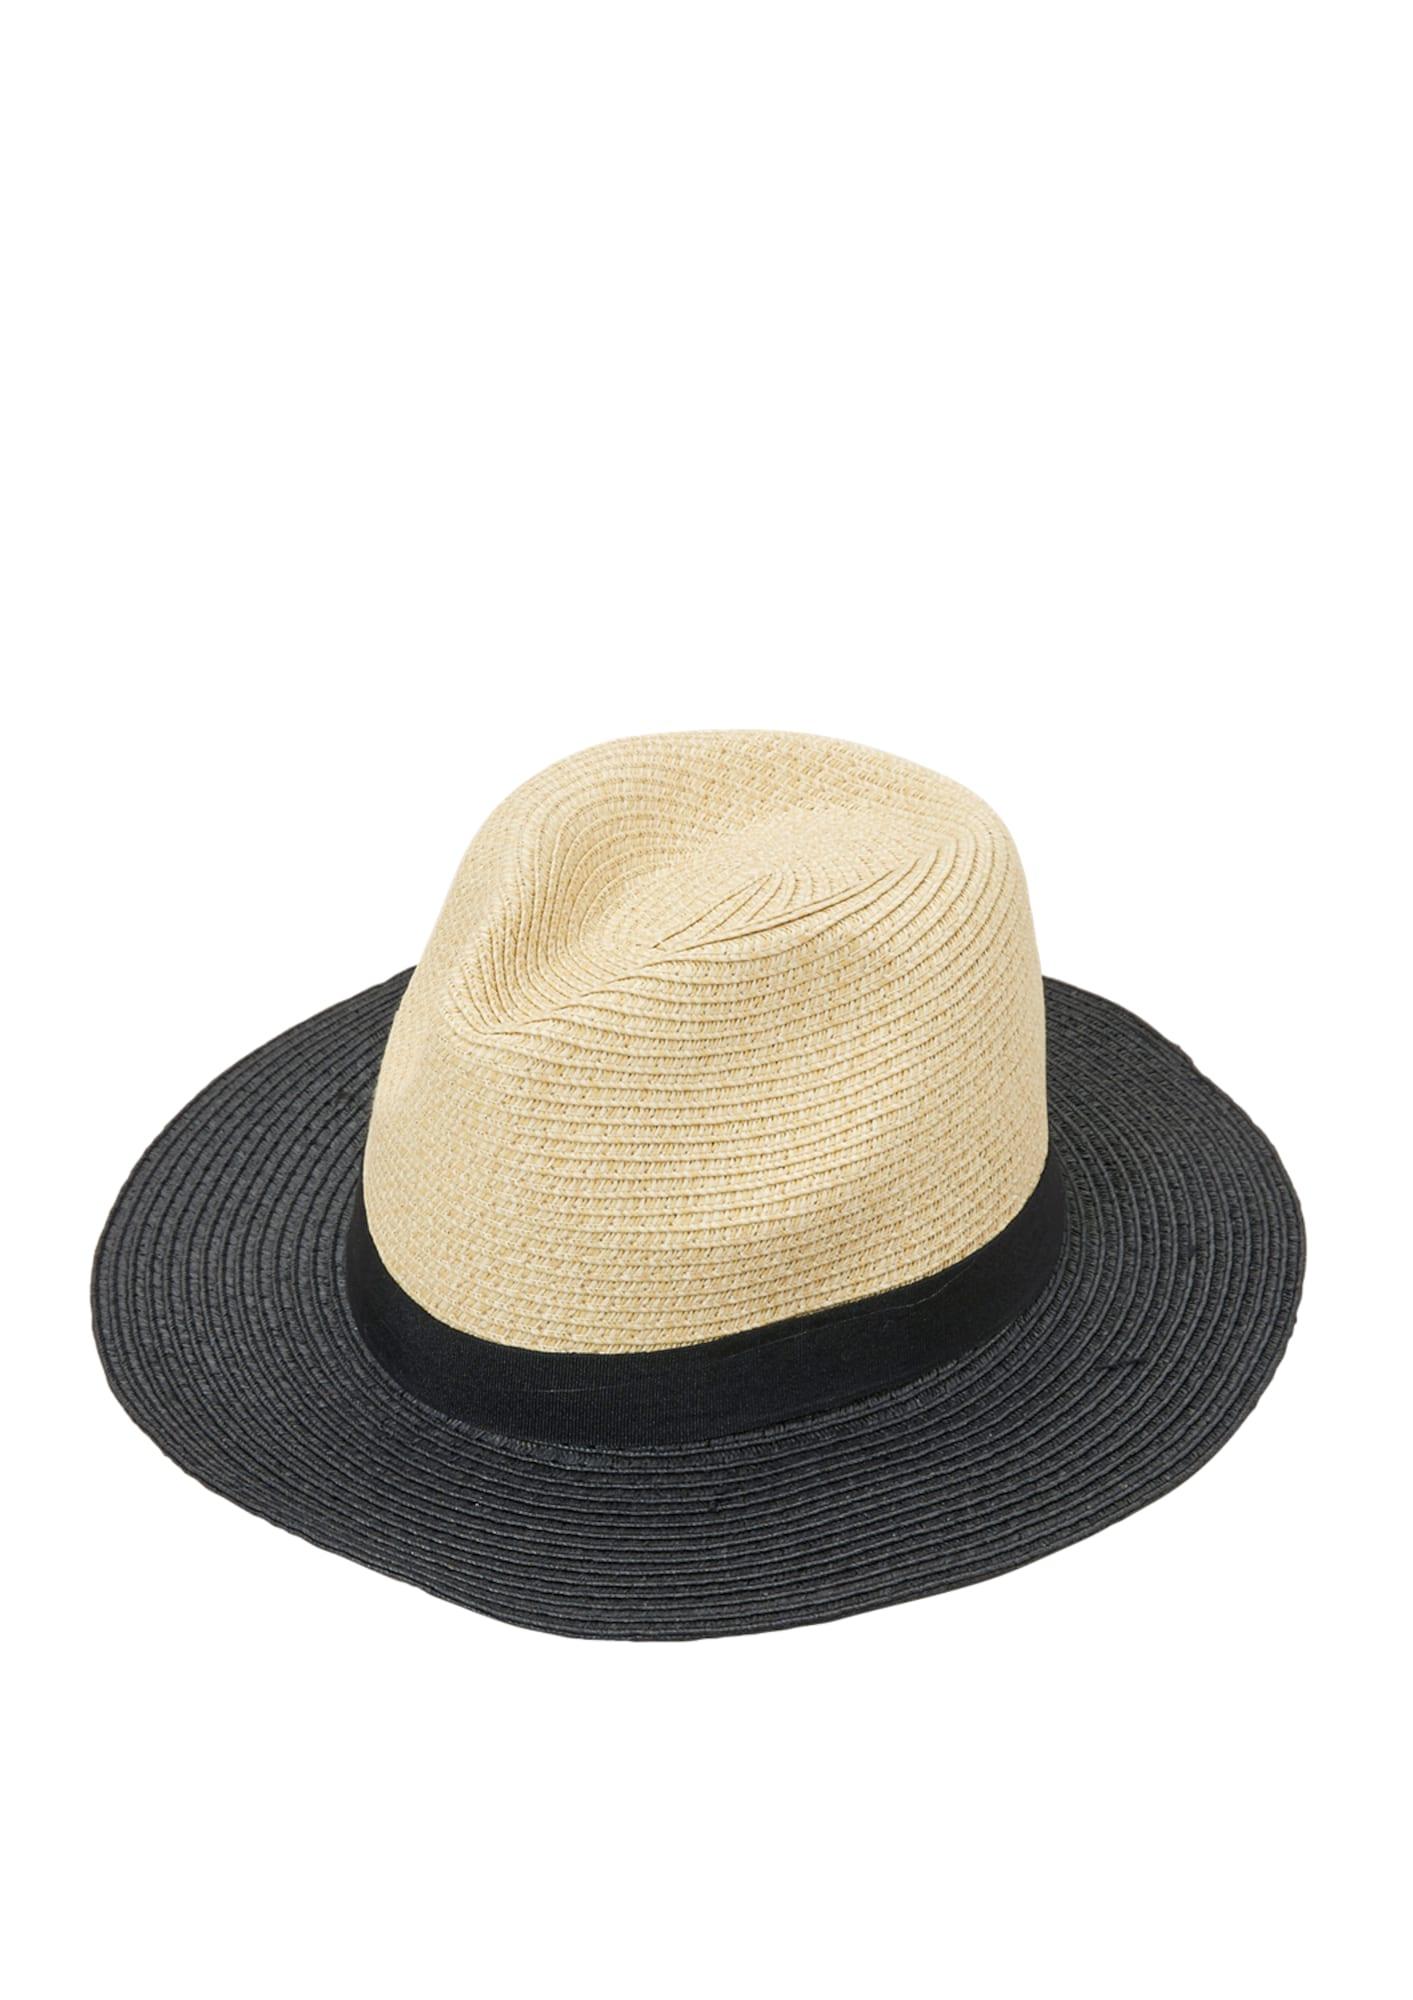 Trilby-Hut mit Kontrastkrempe   Accessoires > Hüte > Trilbys   Beige - Schwarz   S.Oliver